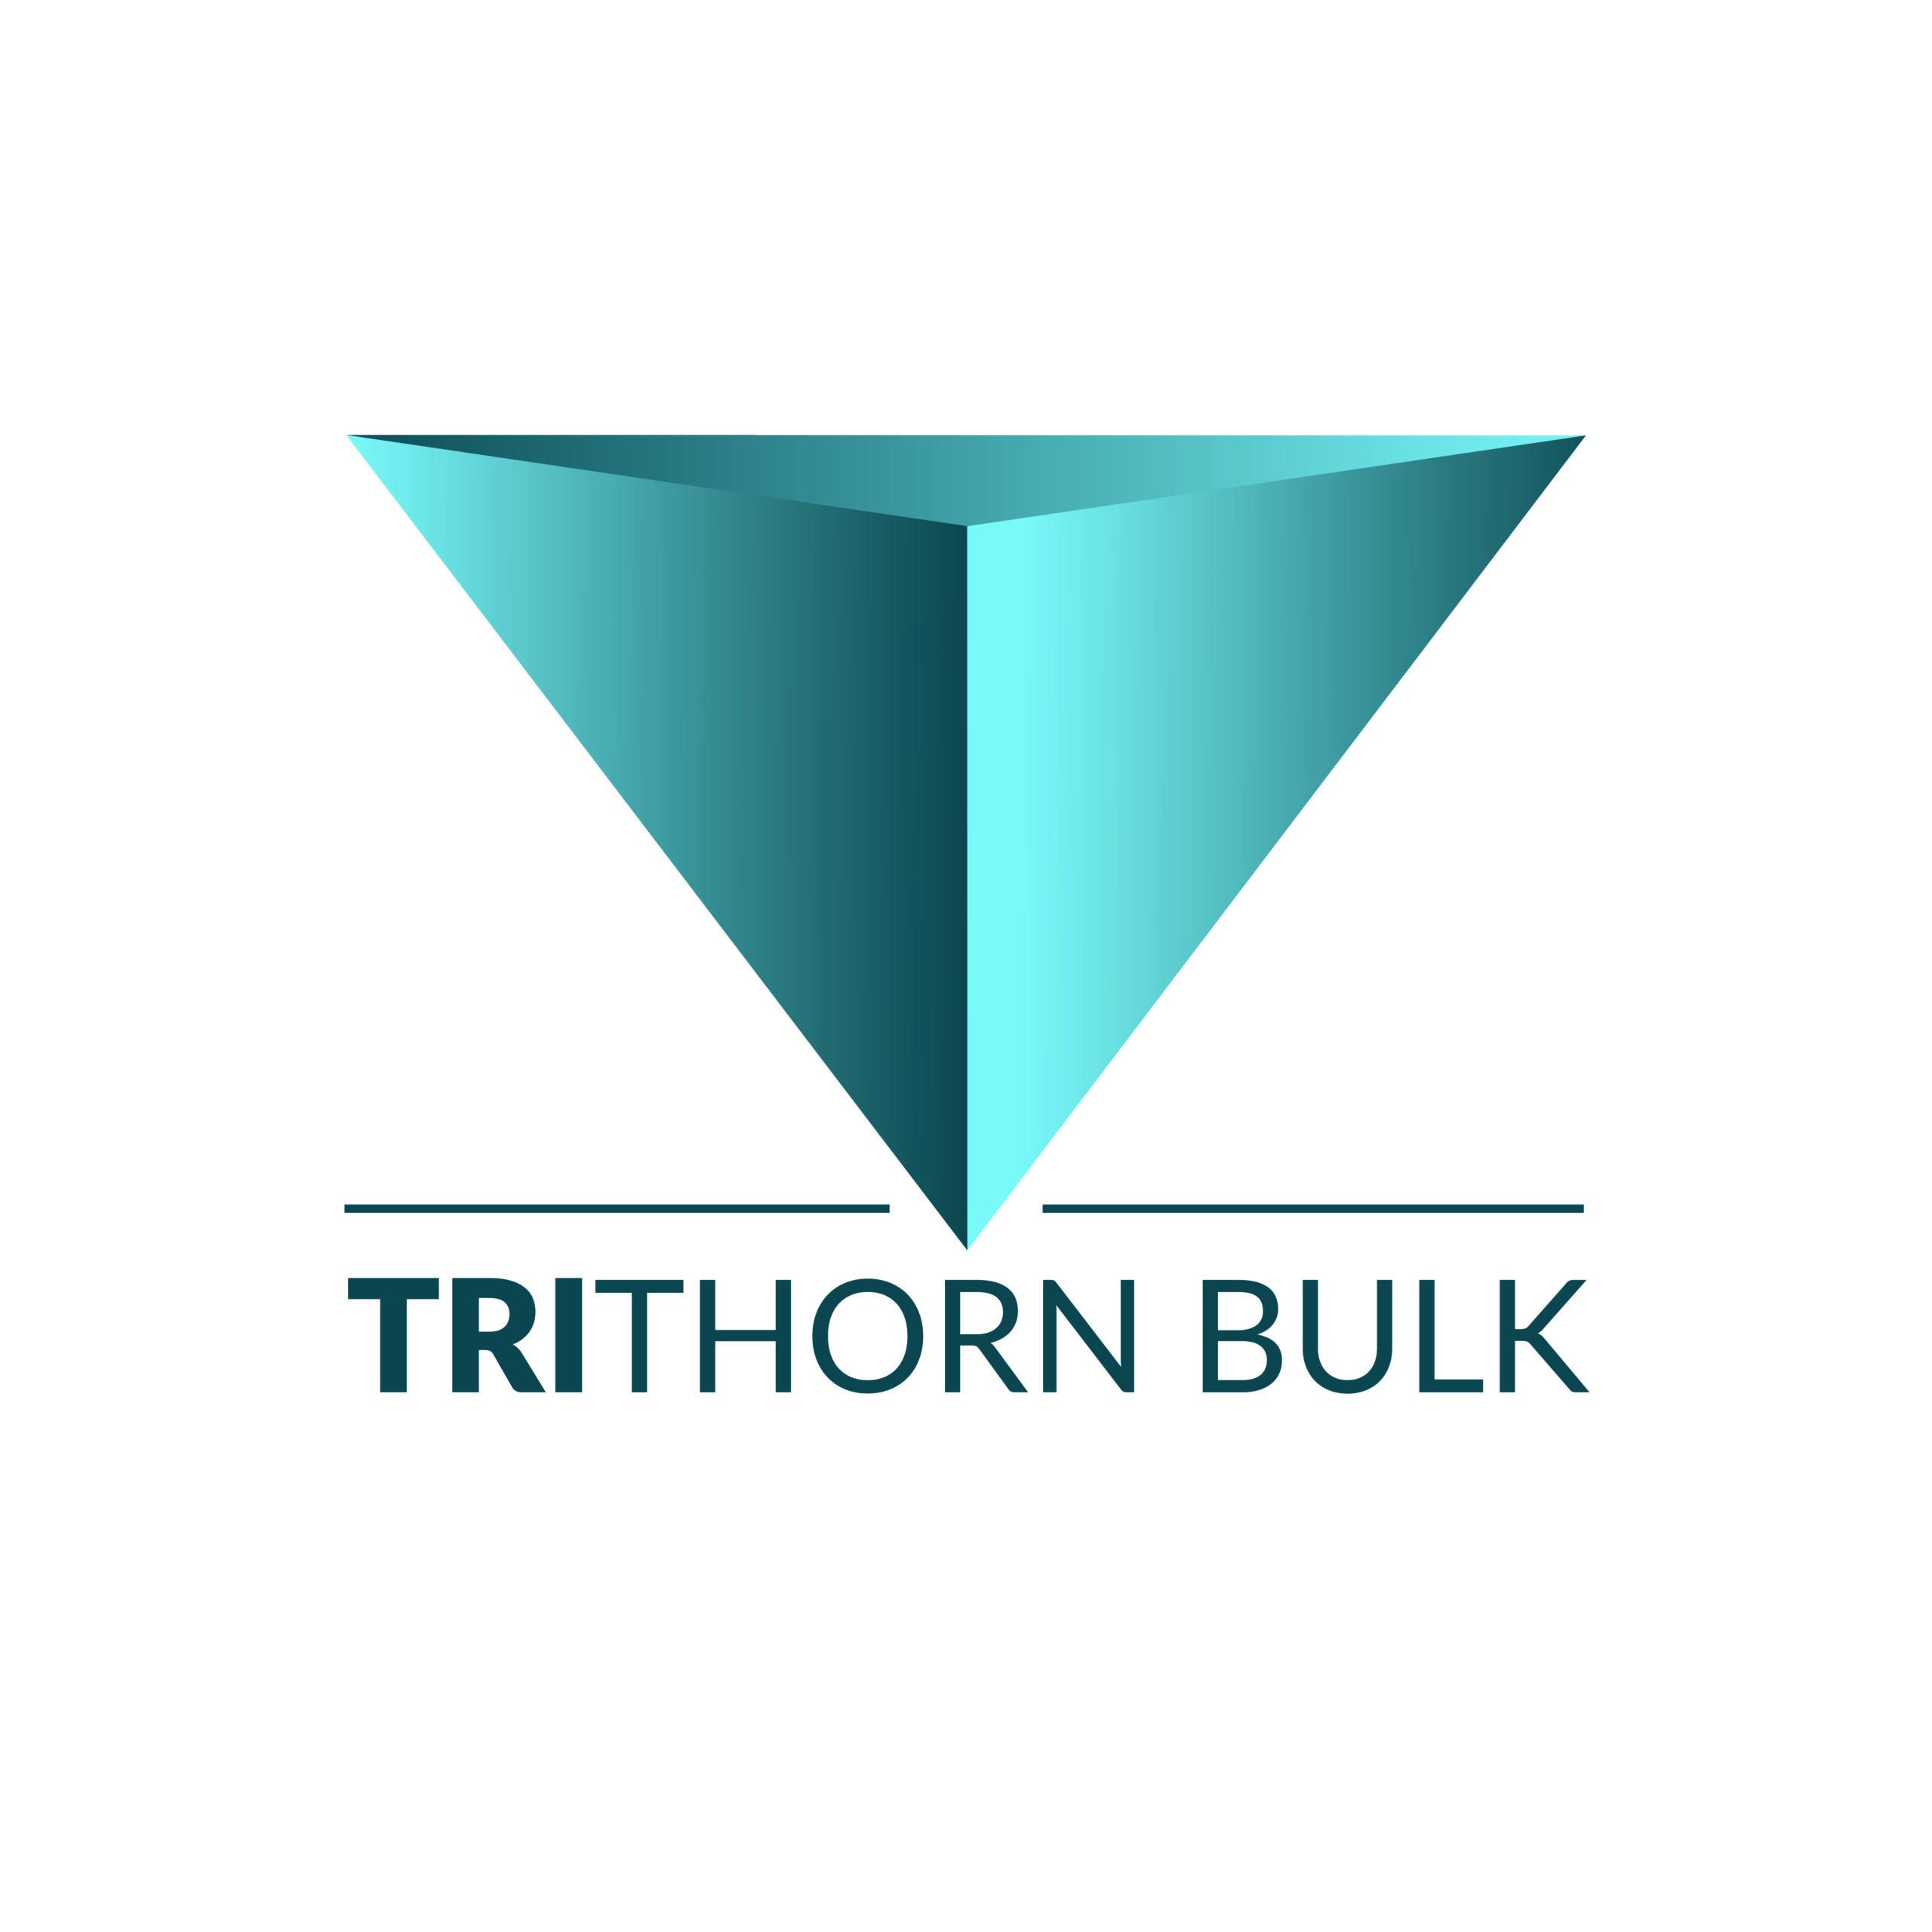 trithornbulk